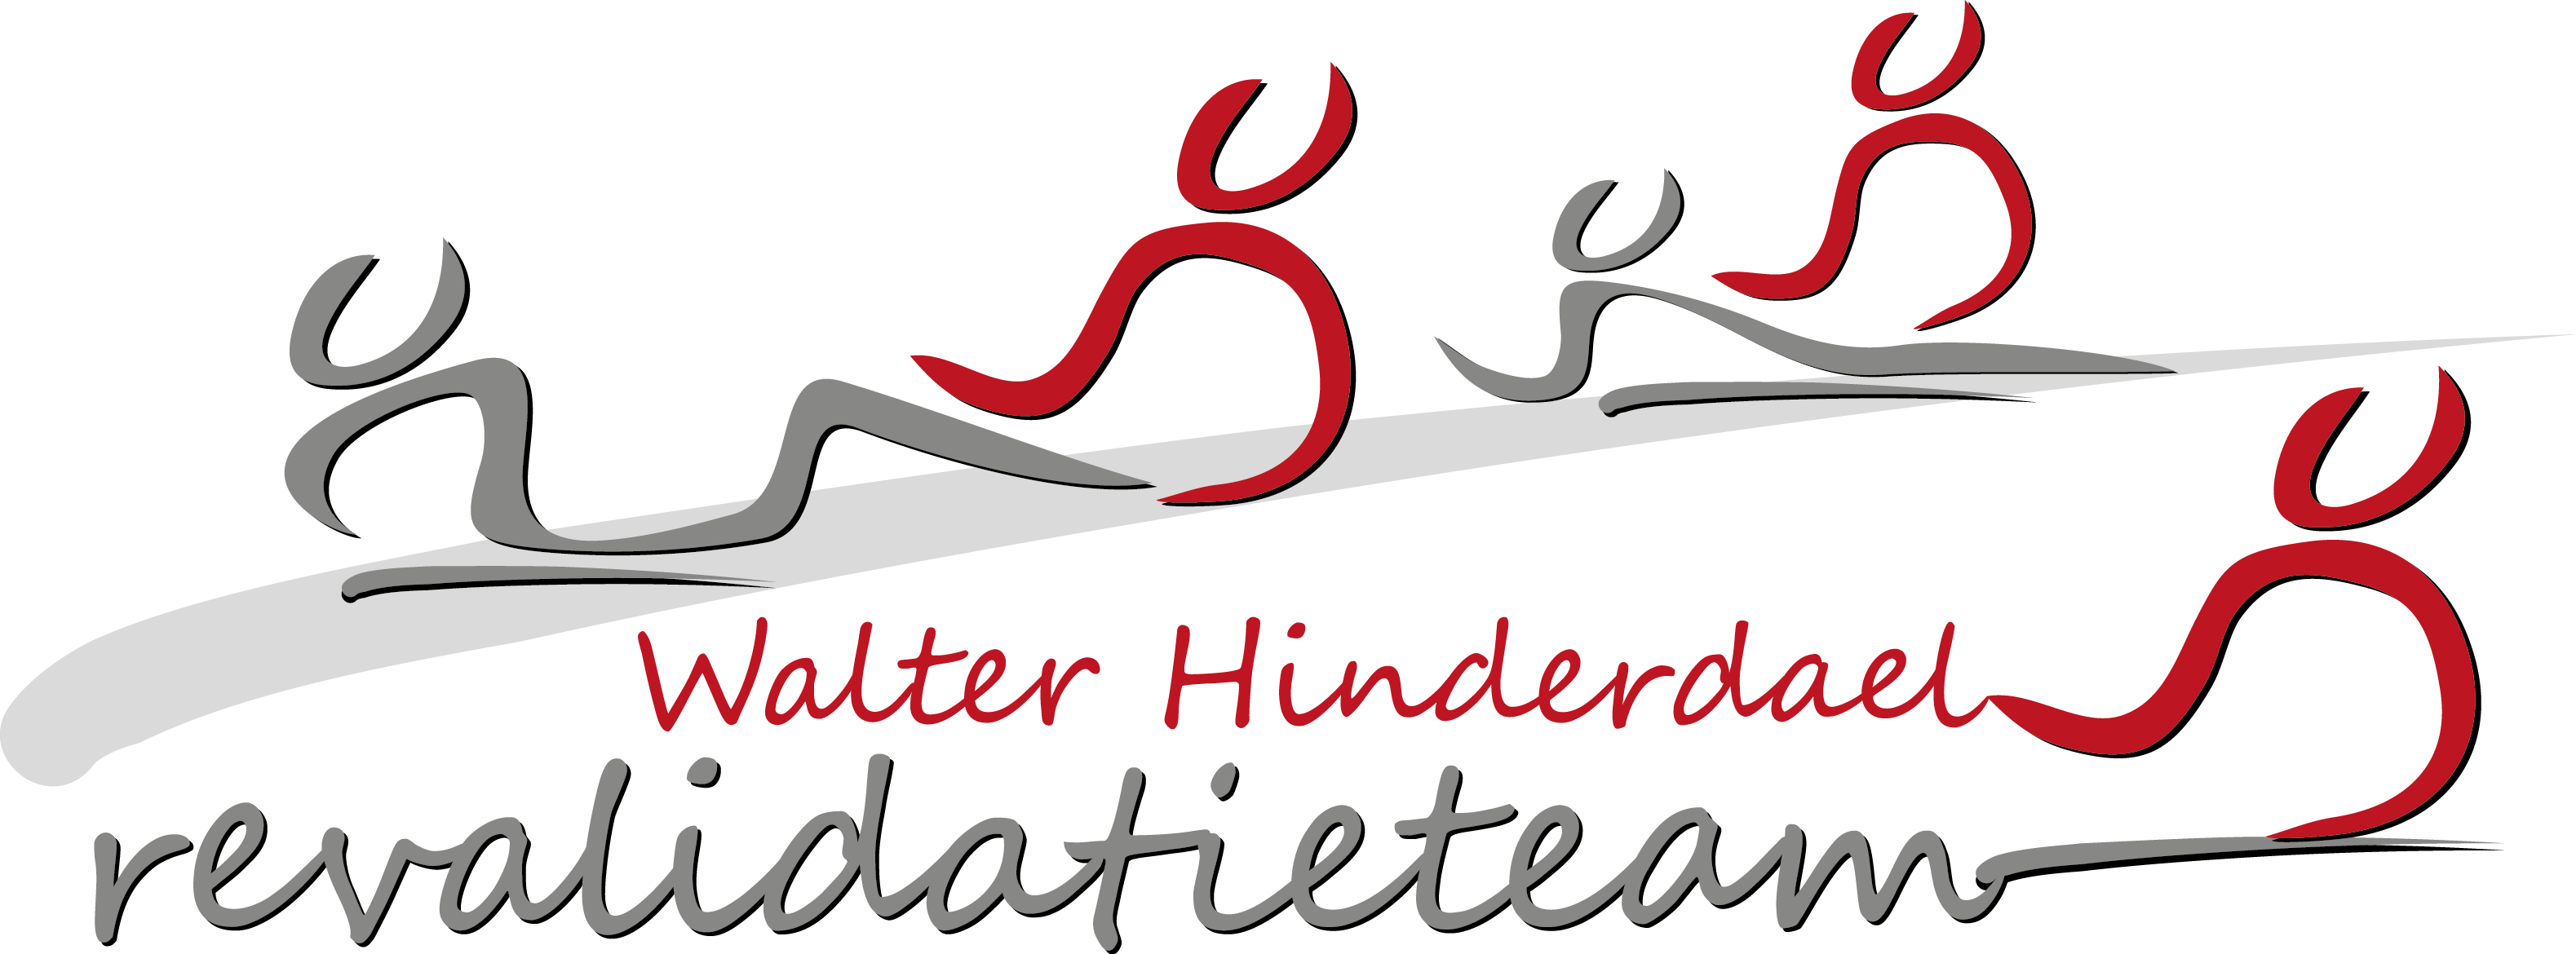 Walter Hinderdael Revalidatieteam logo